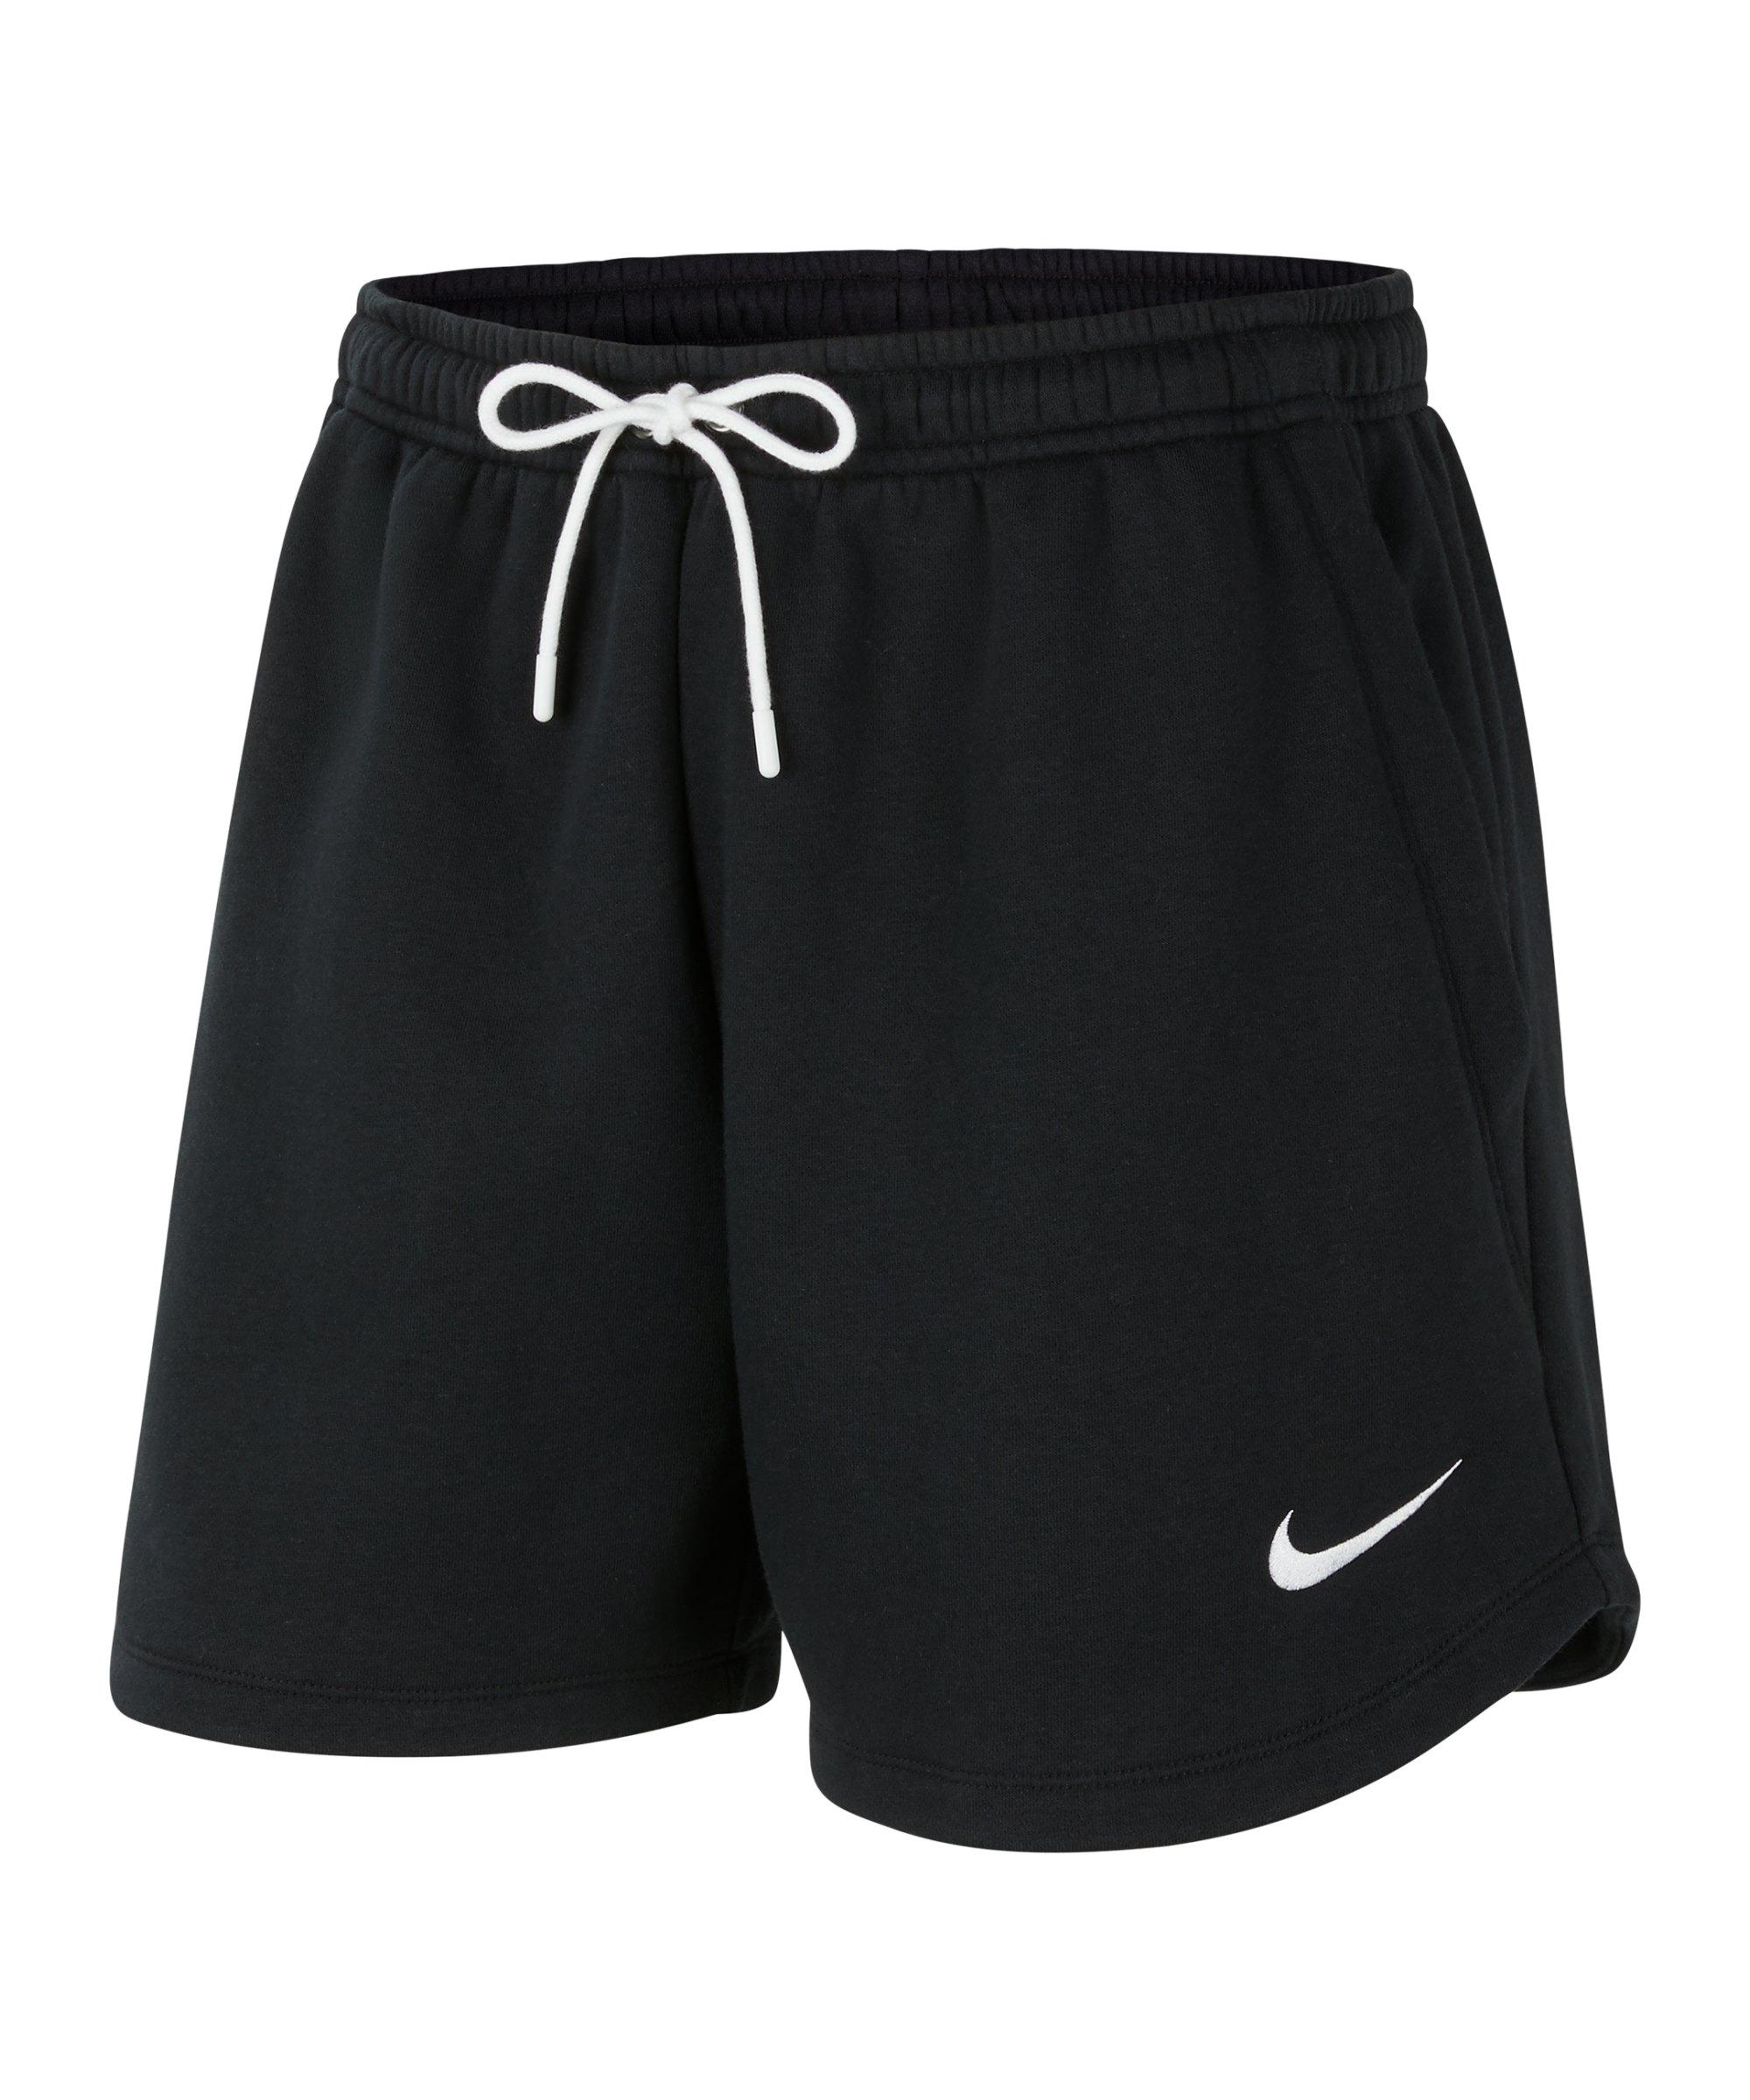 Nike Park 20 Fleece Short Damen Schwarz Weiss F010 - schwarz